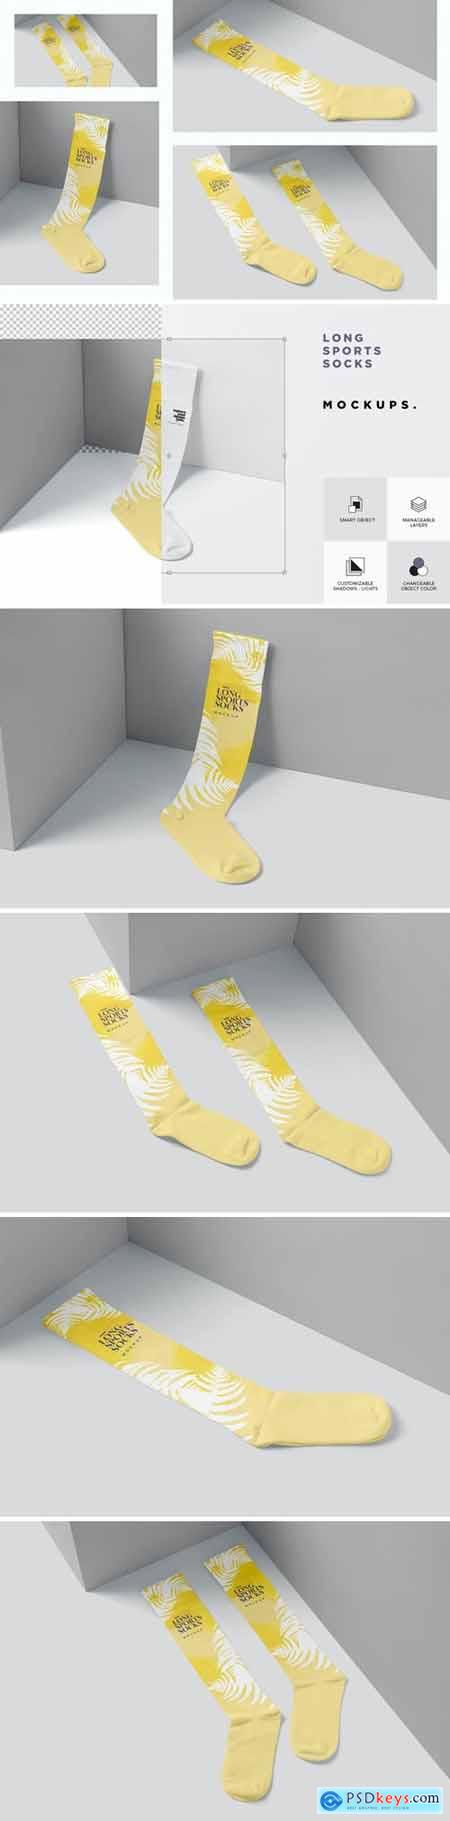 Long Socks Mockups